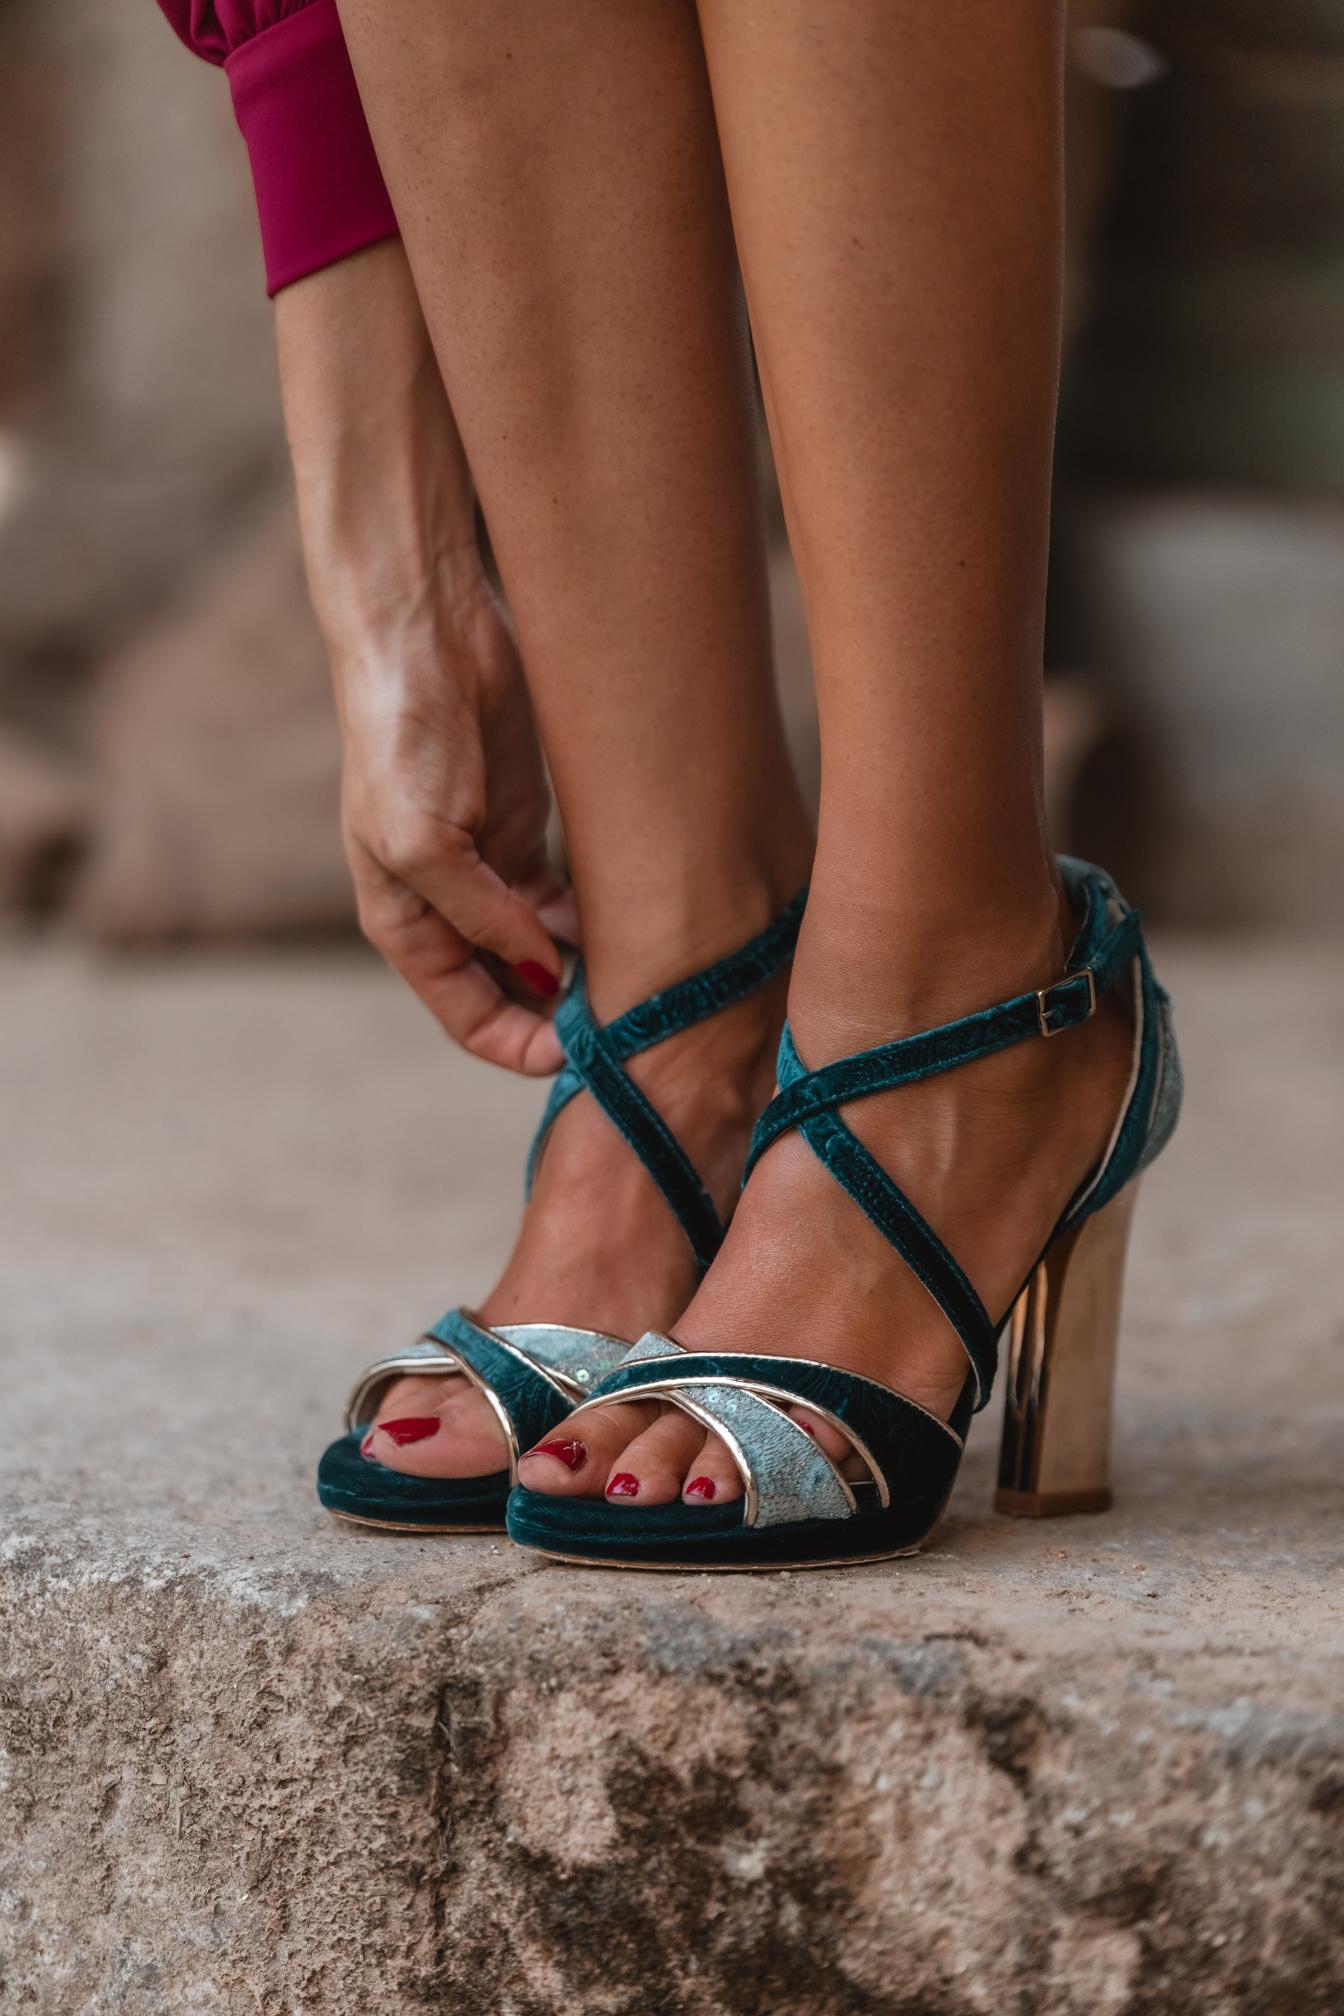 Sandalia terciopelo turquesa invitada novia